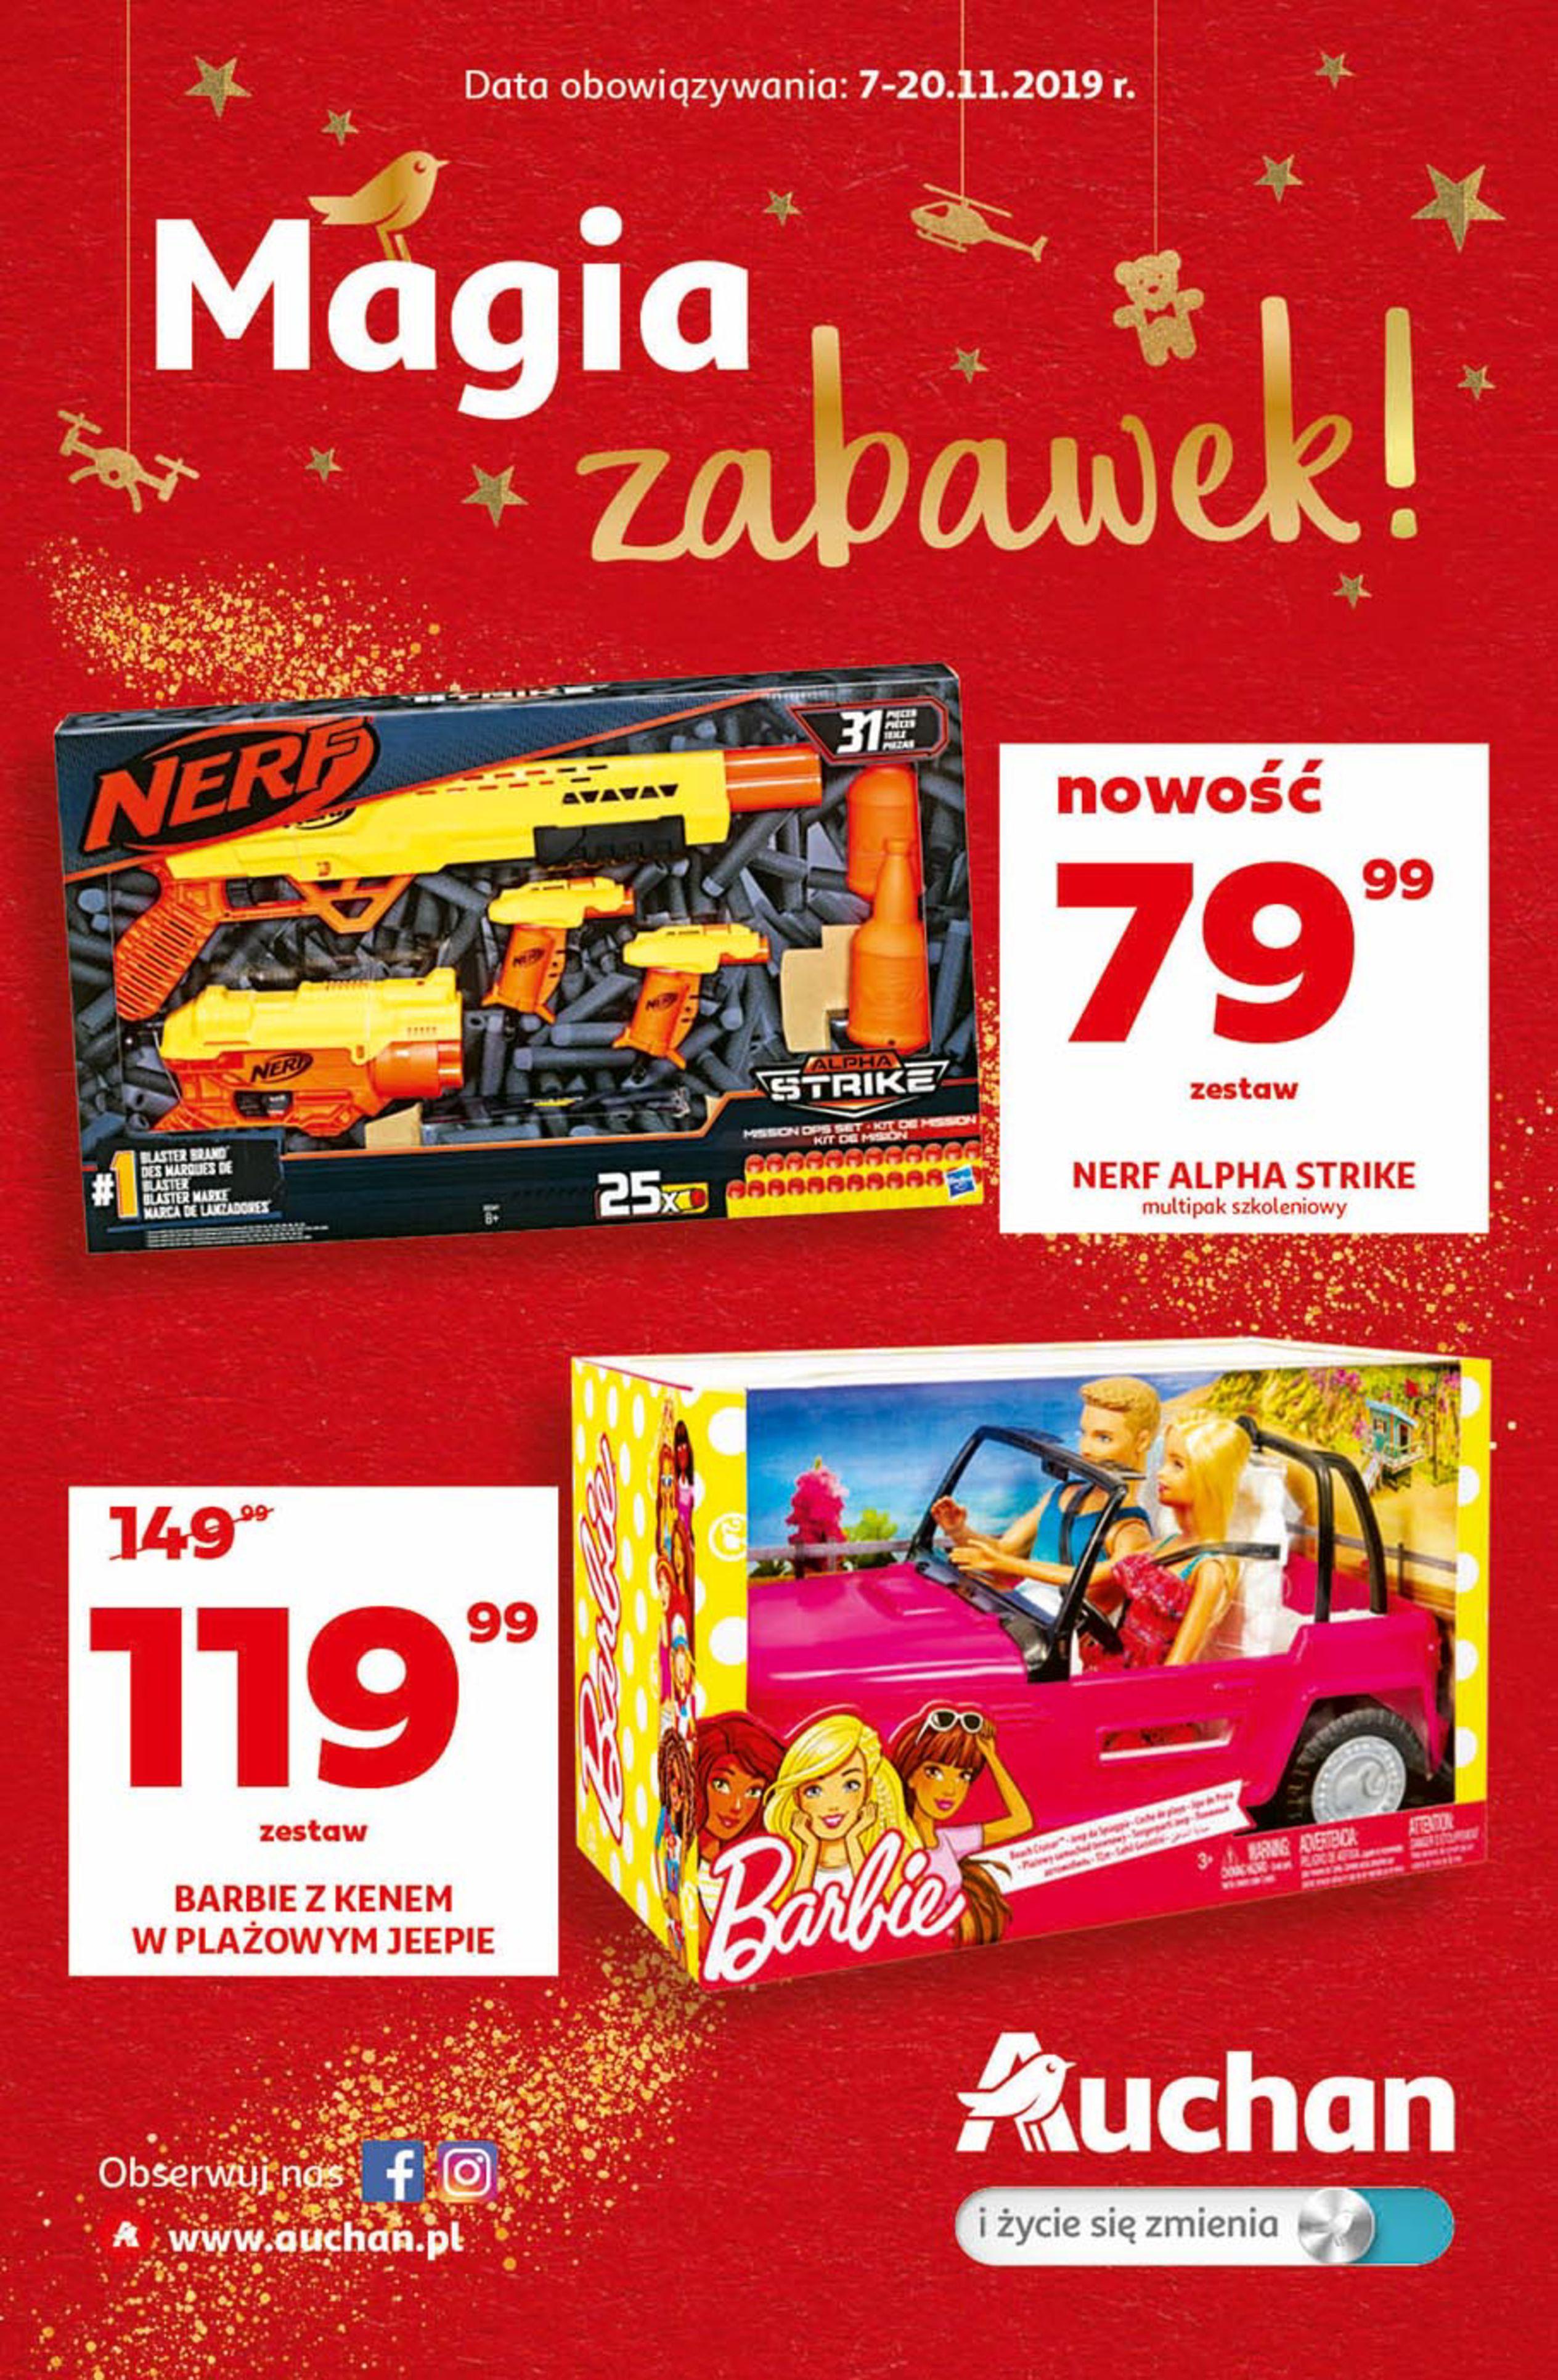 Gazetka Auchan - Magia zabawek Hipermarkety-06.11.2019-20.11.2019-page-1